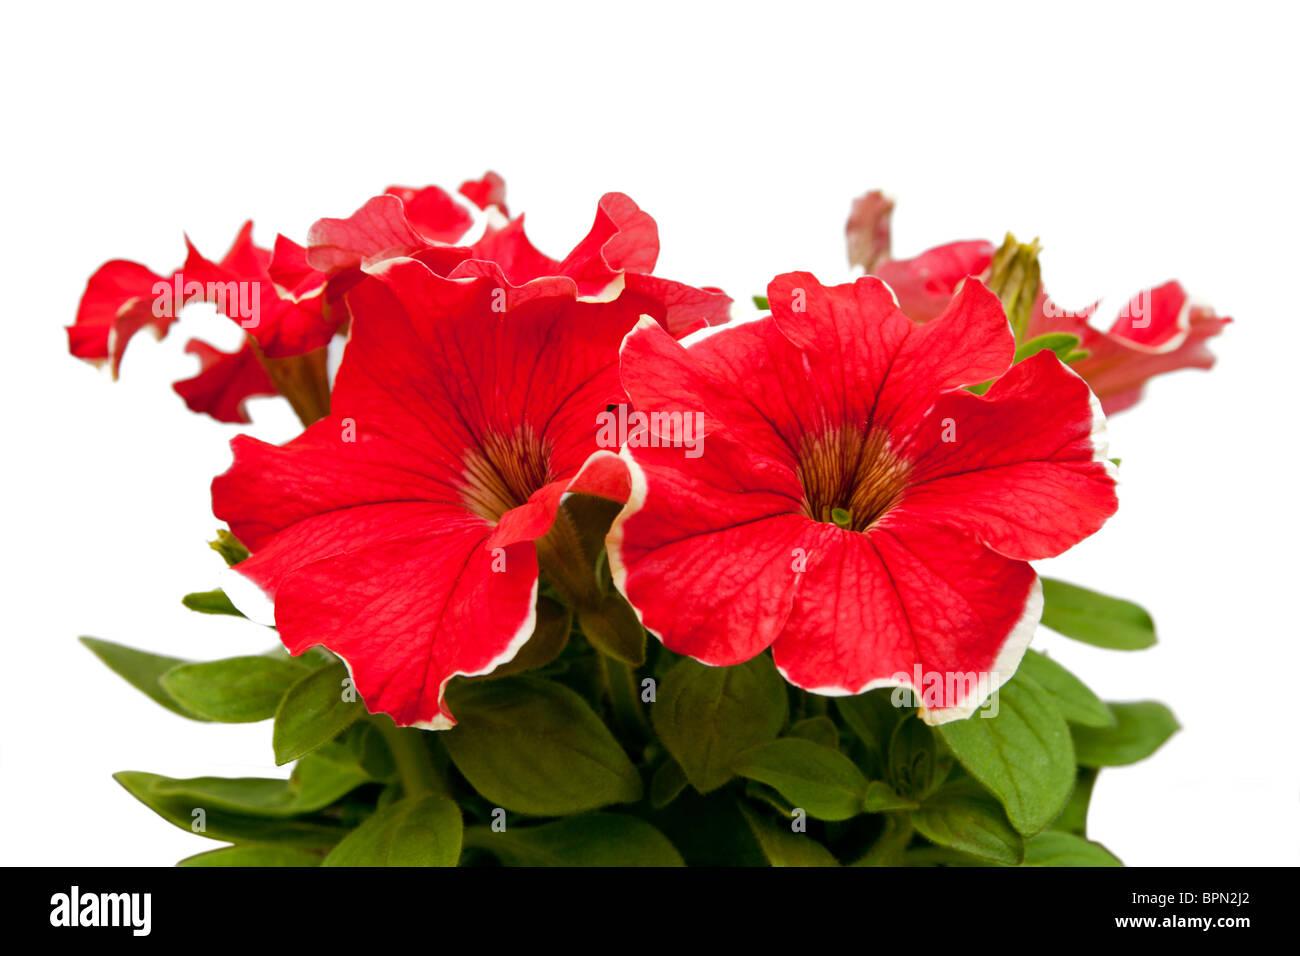 hothouse plant a petunia for landscape design - Stock Image